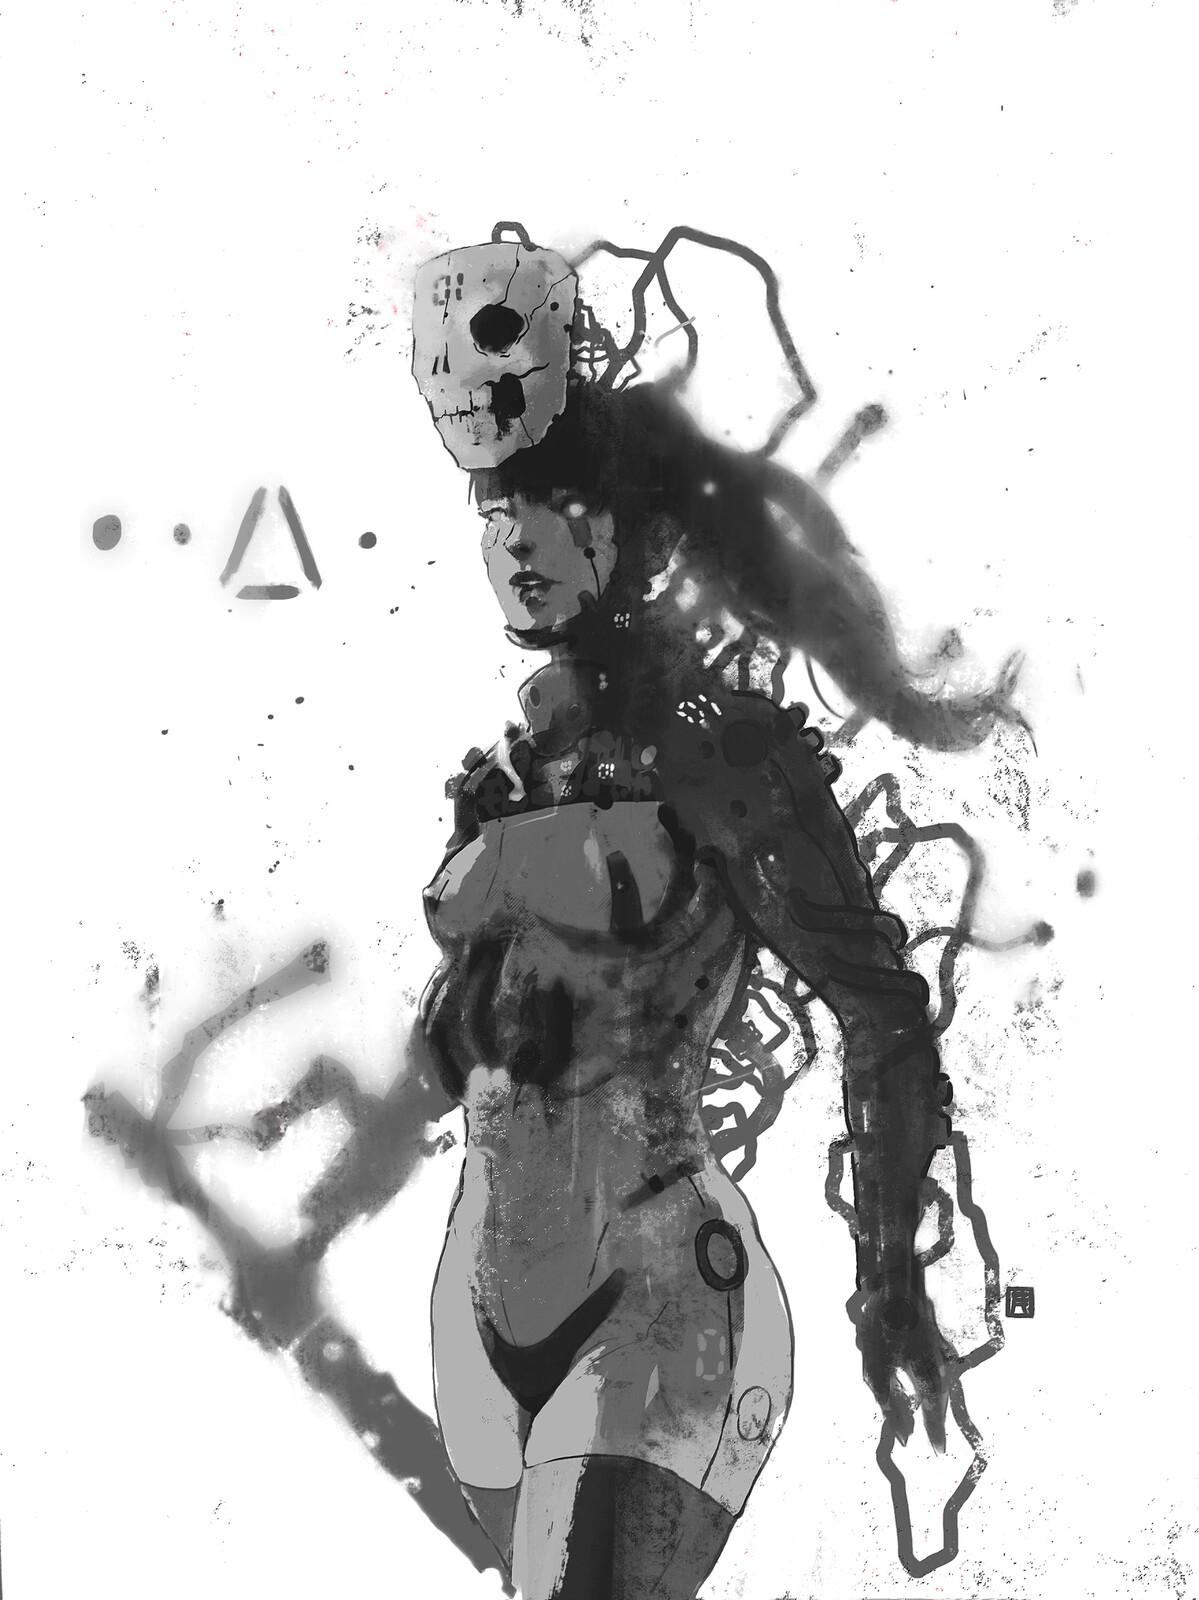 Empress//01 and Sketch Batch//